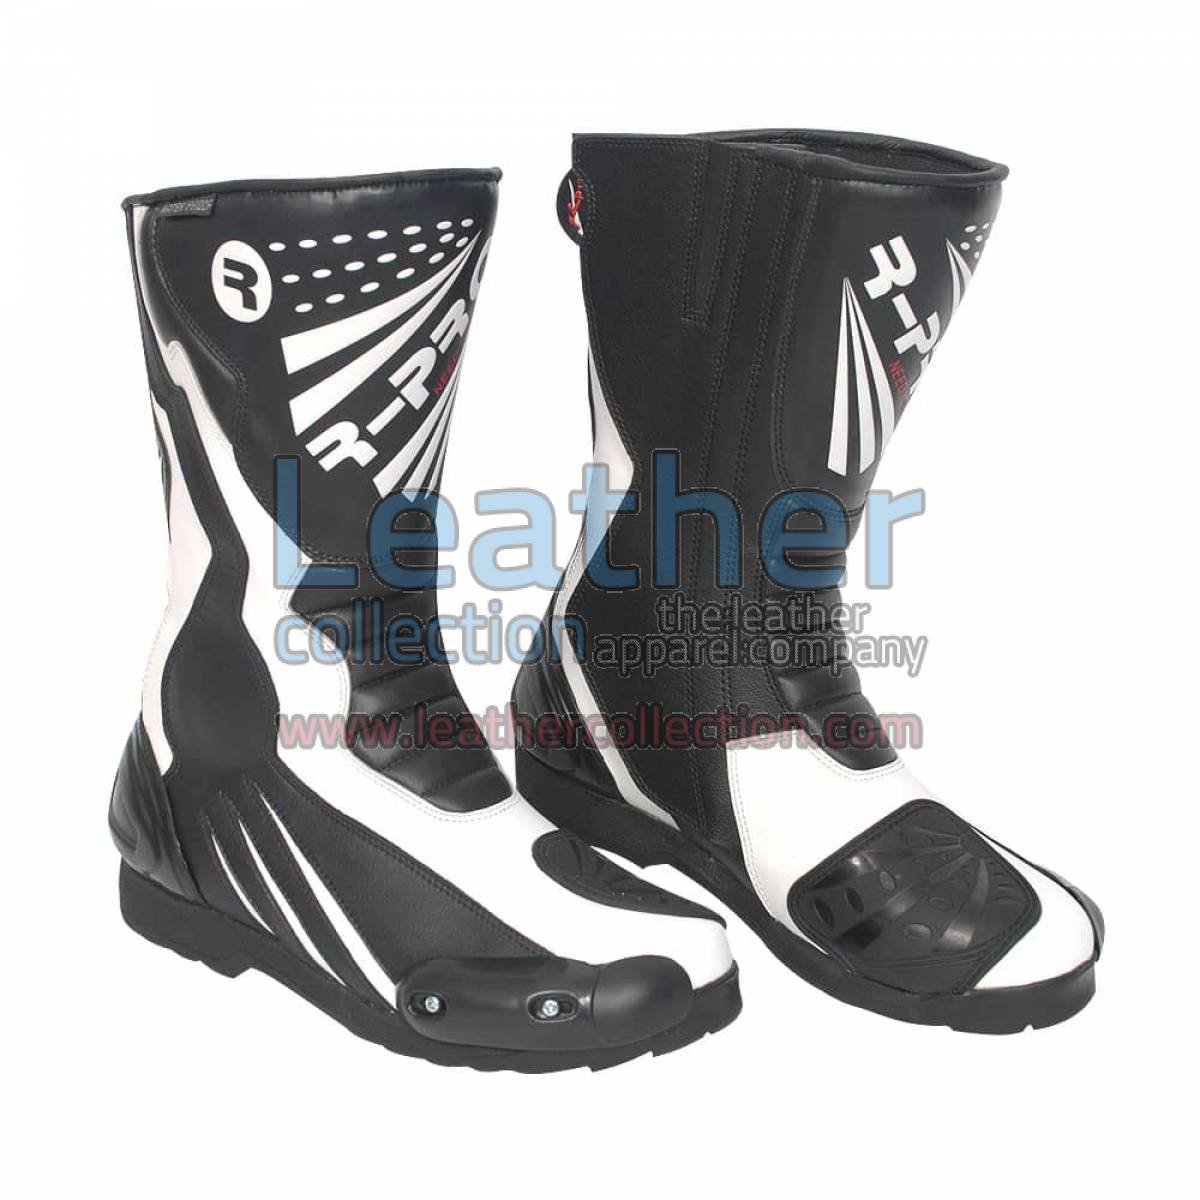 Legend Leather Moto Boots Black & White